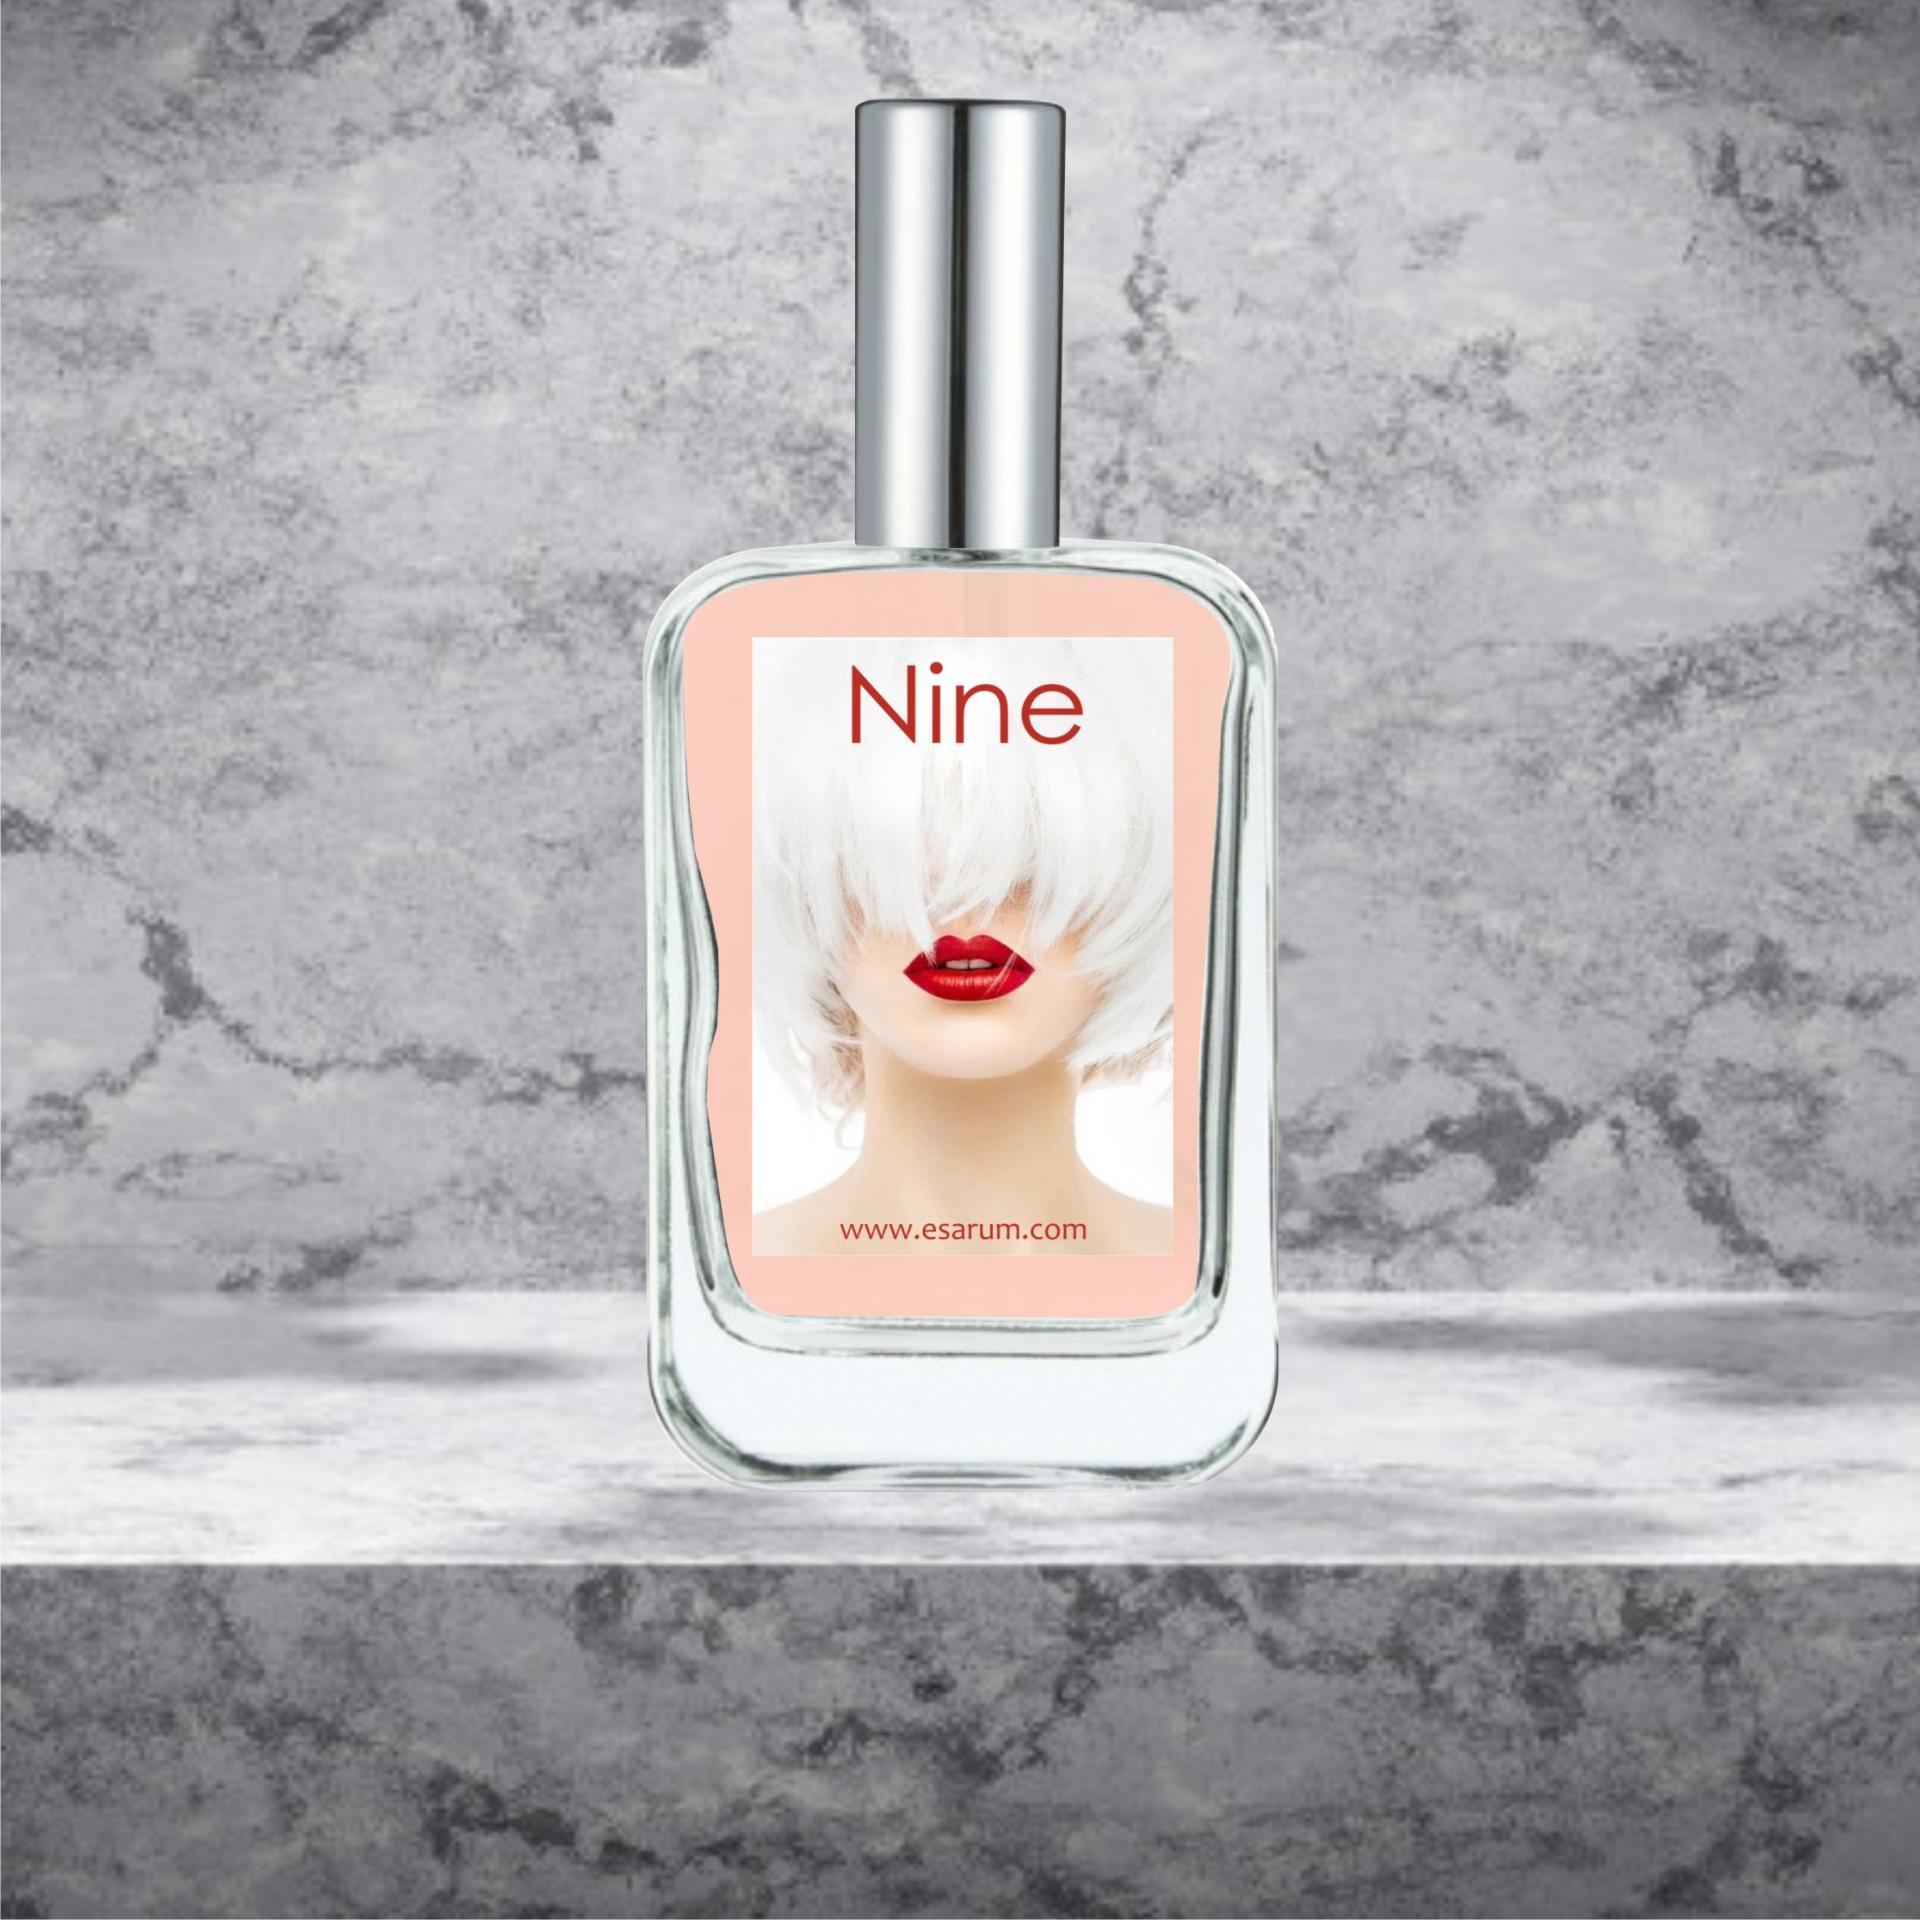 ESARUM.COM  - NINE PERFUME PERMANENTE, 50 ML. Si te gusta NINA de NINA RICCI !